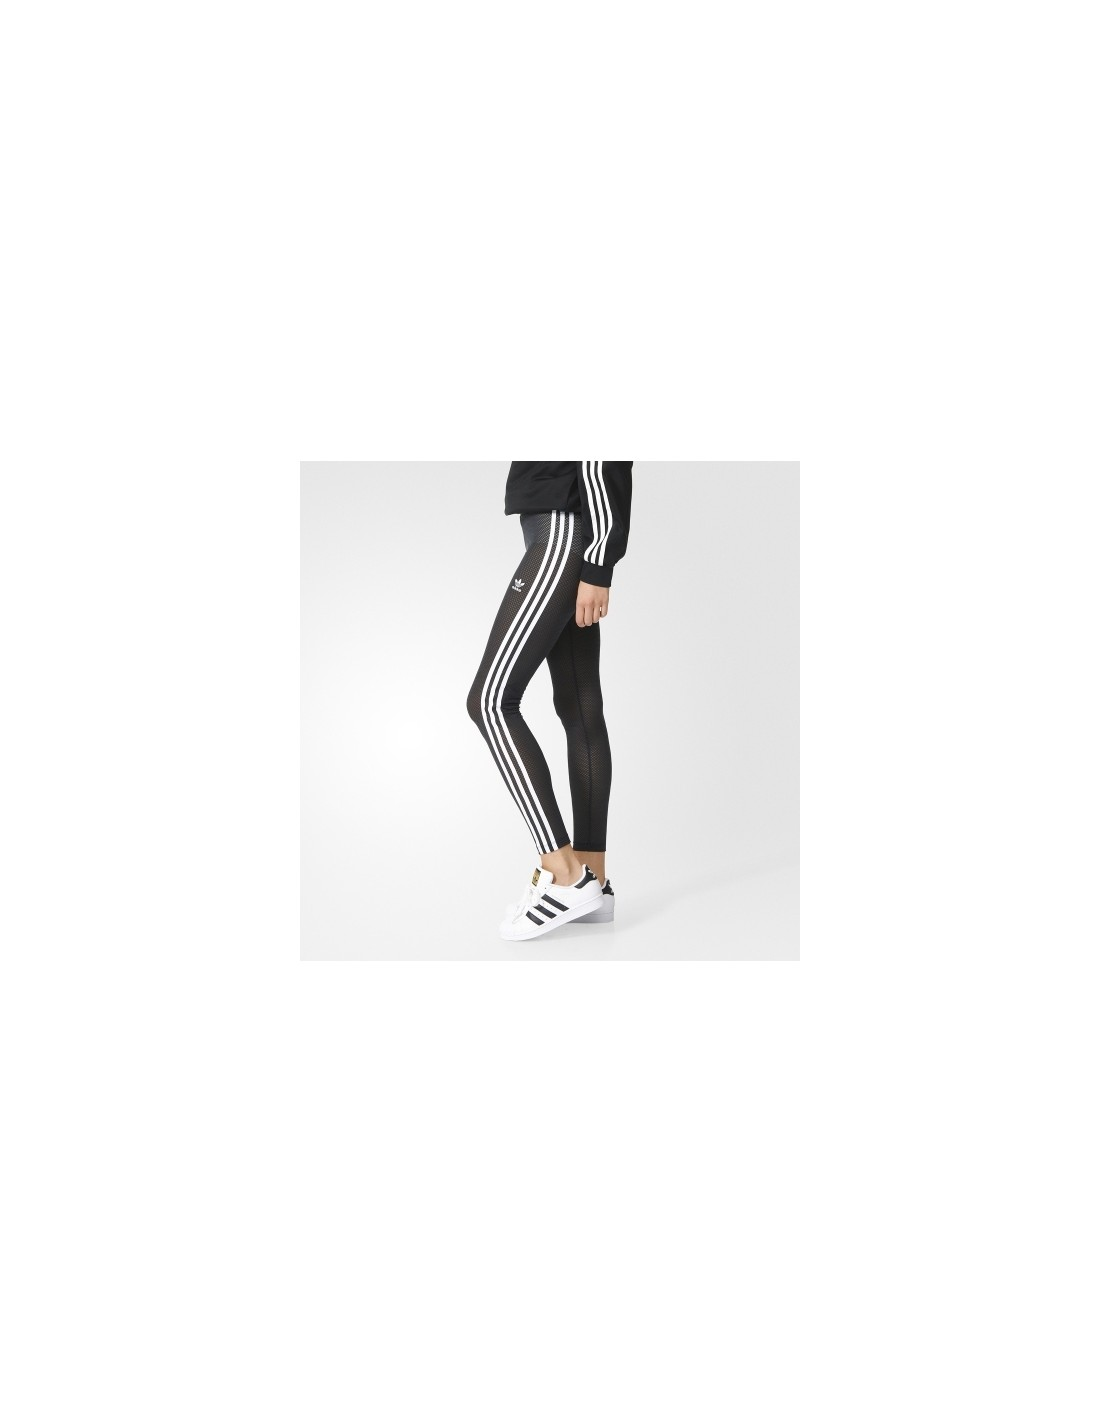 ad131d2d9439f ... Adidas Originals Womens PP Leggings Black/White AA3892 ...